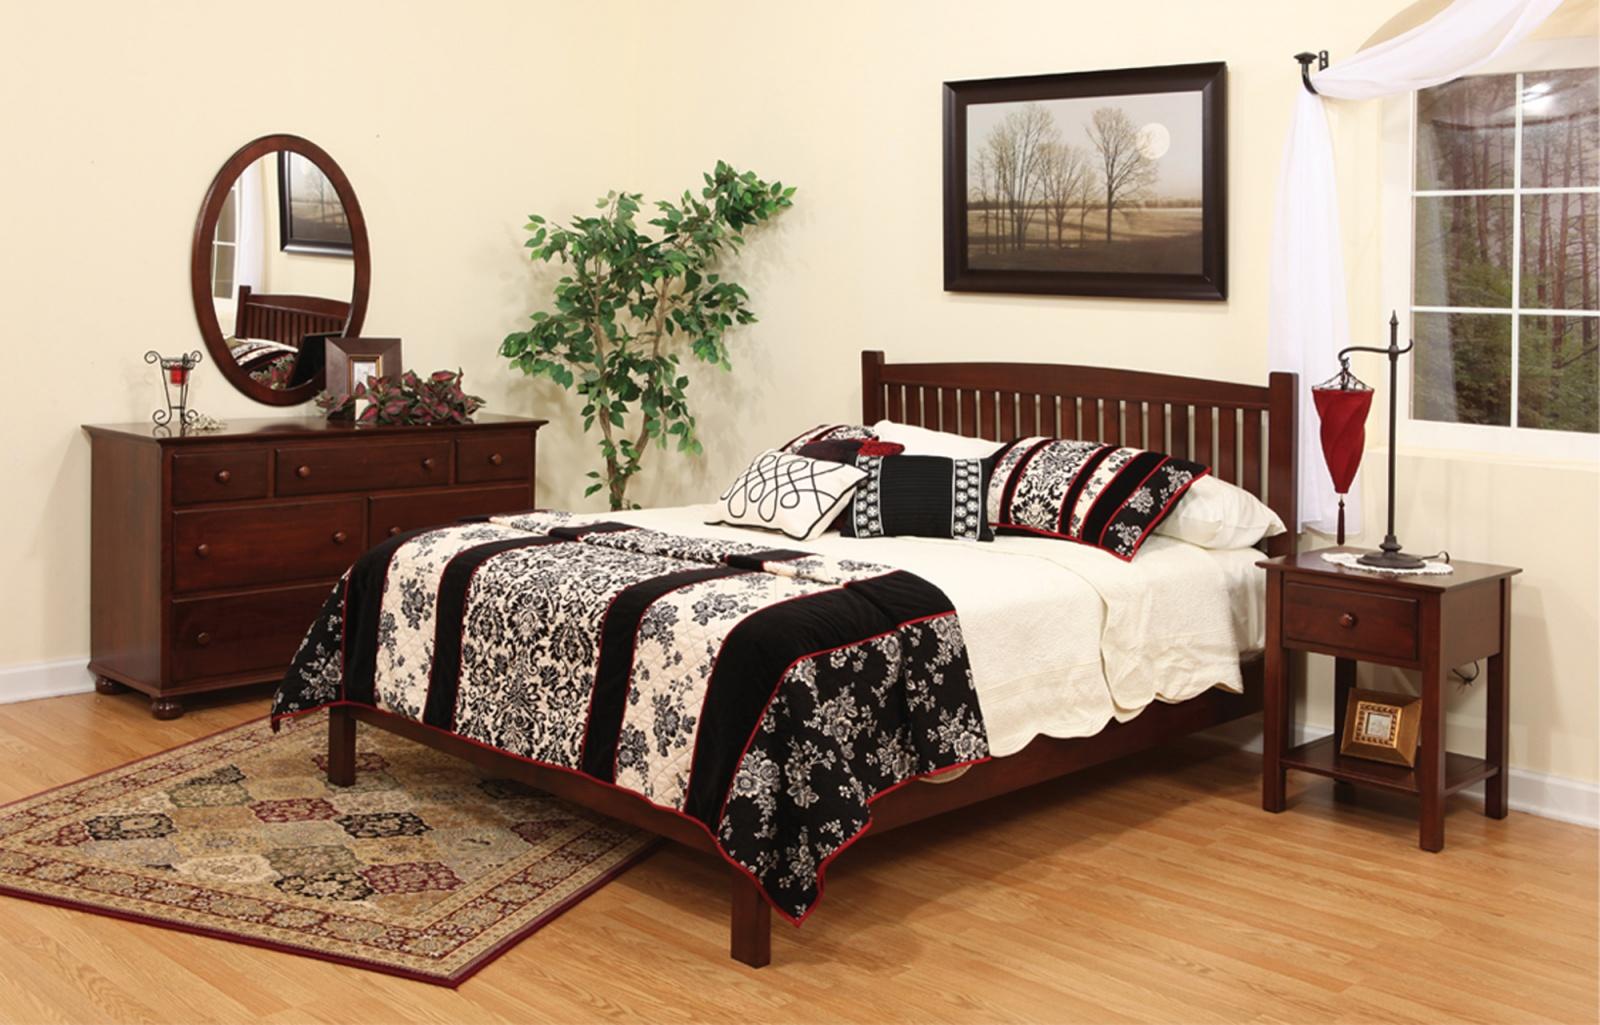 Luellen Setting with Sleepwell Bed.jpg